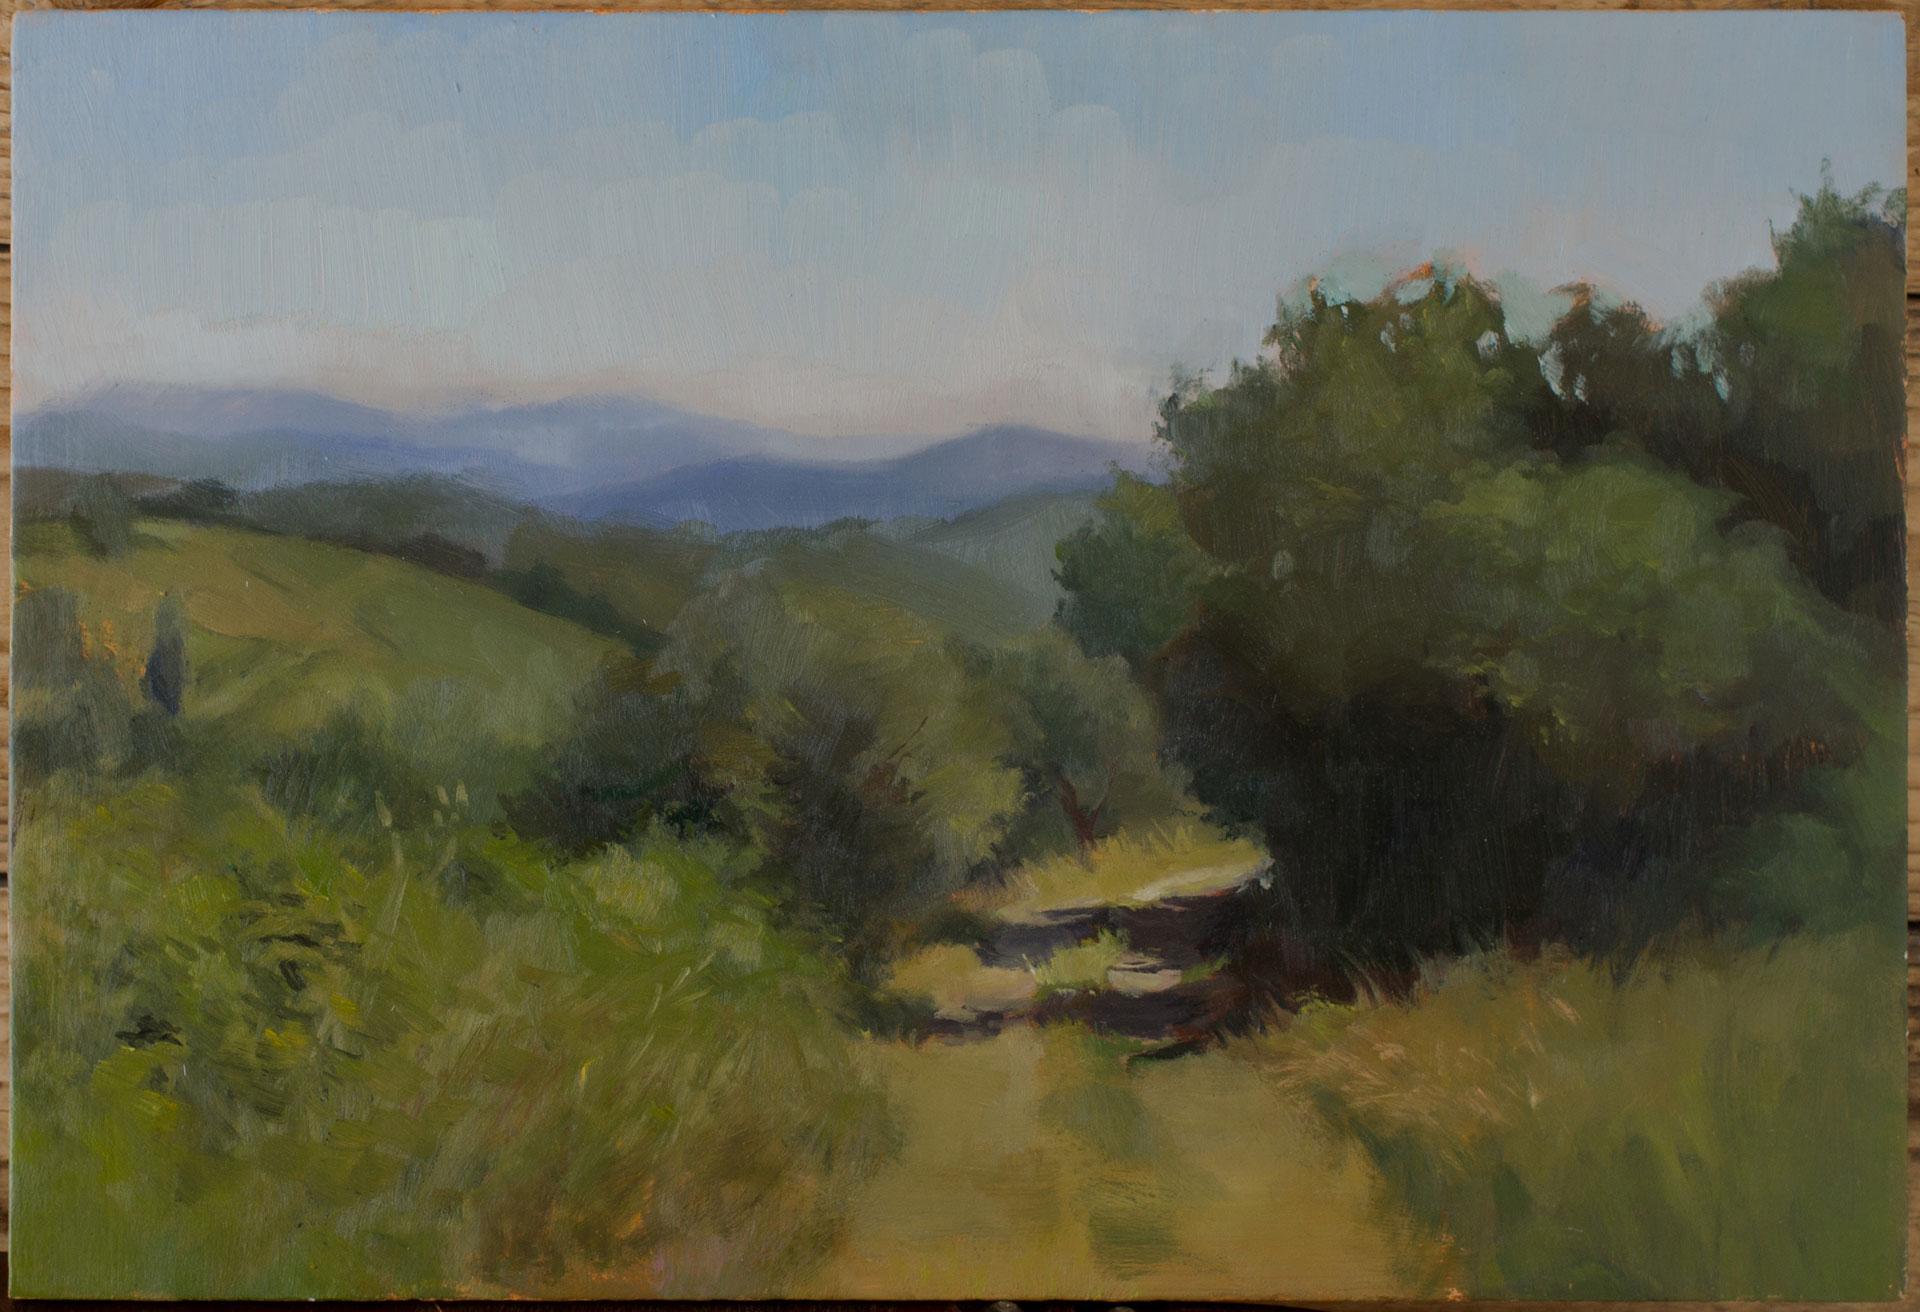 Pathway into tuscan hills - Sahra Becherer (Teacher)